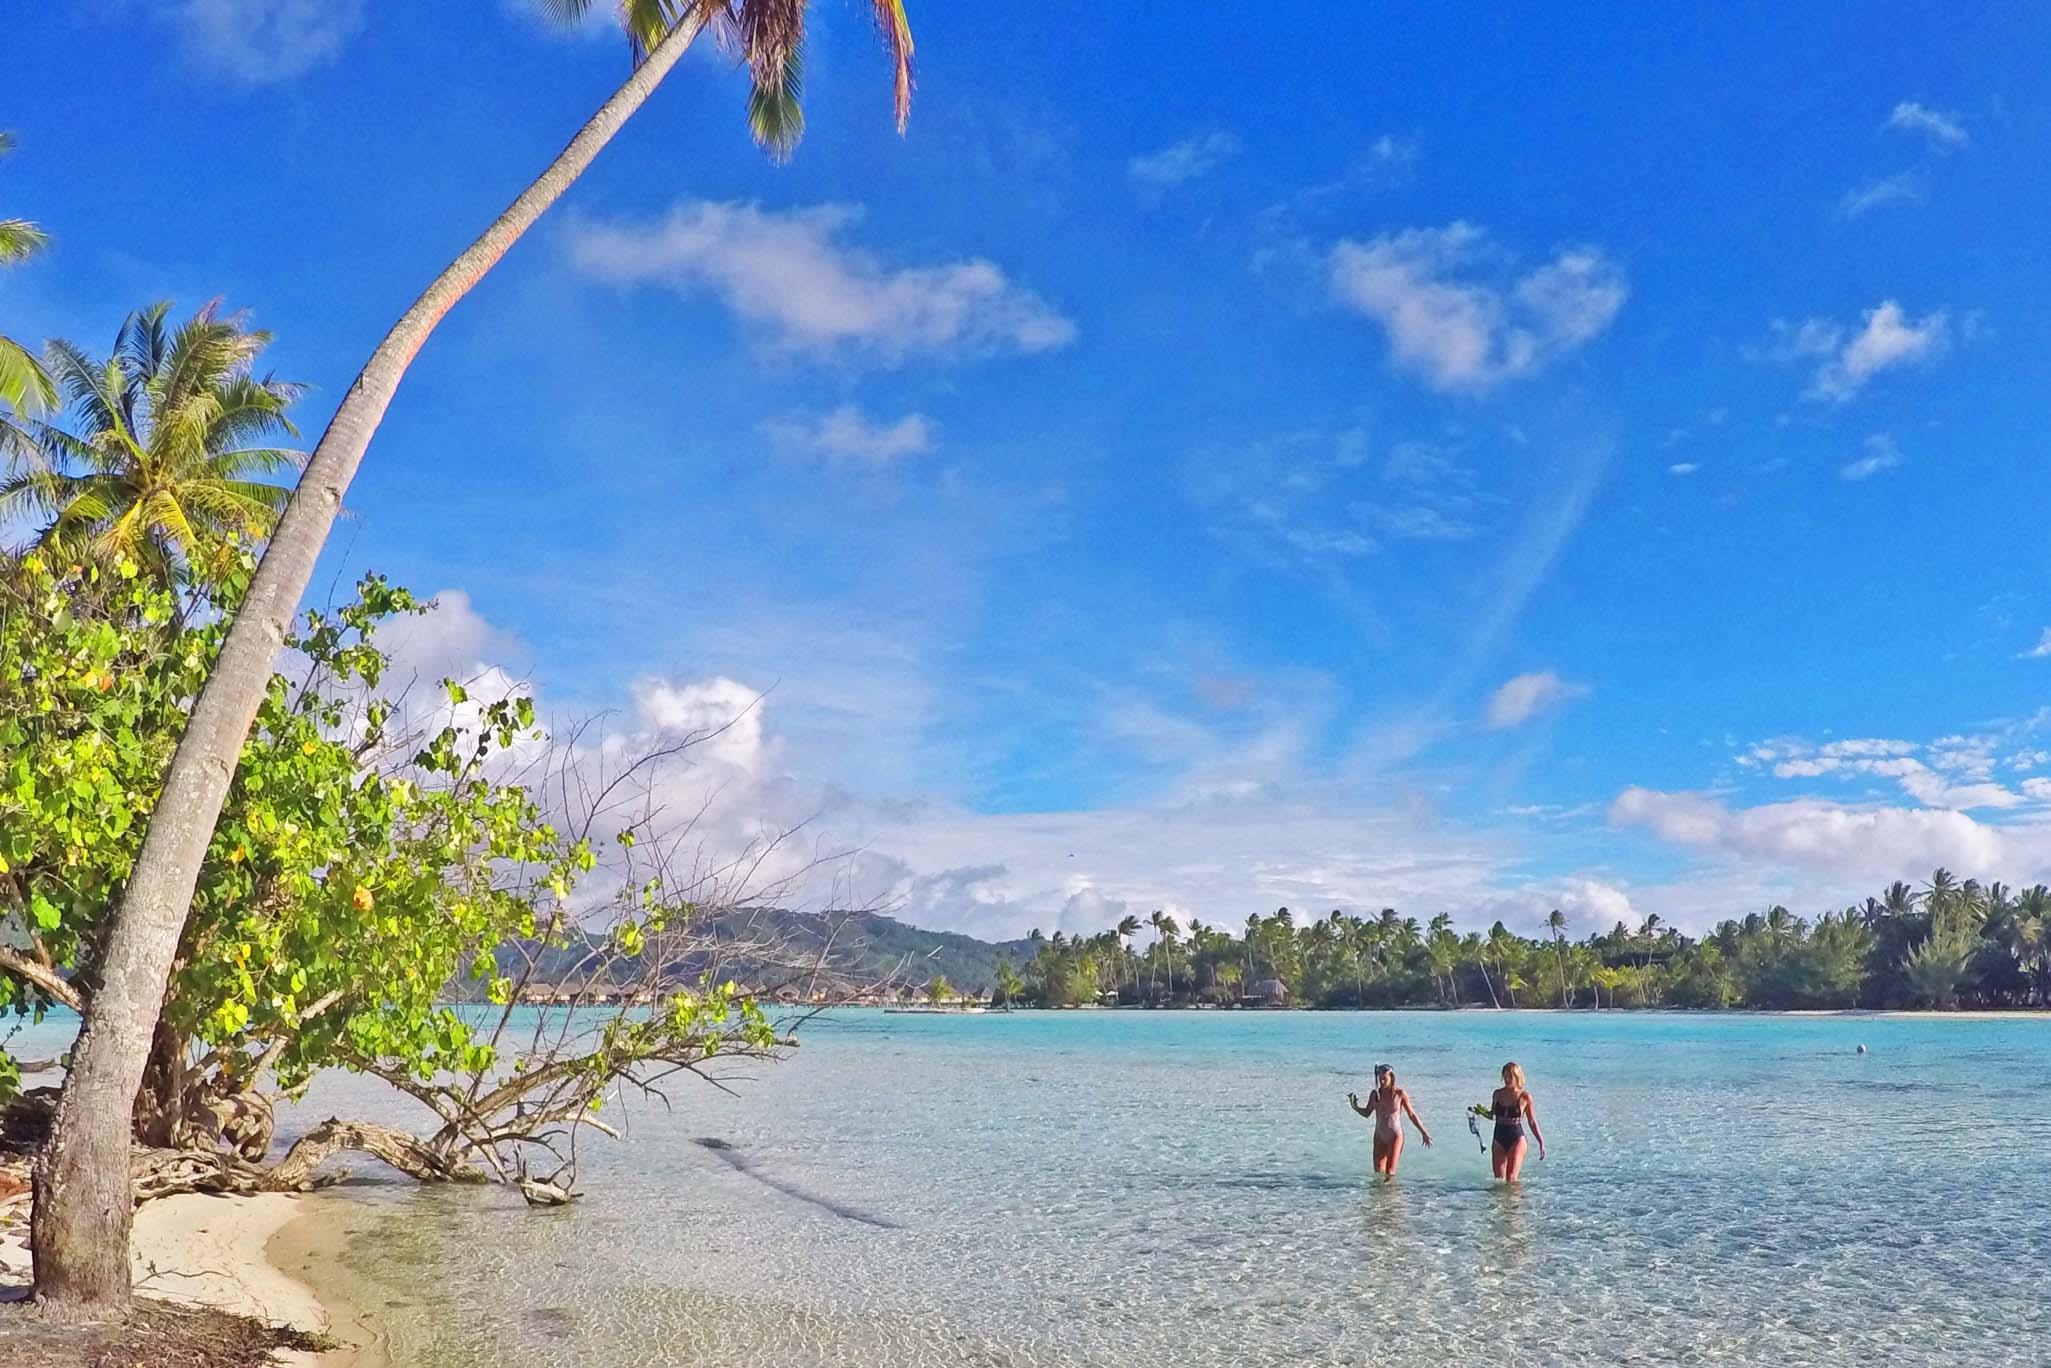 É nesse canal que fica o Coral Garden - snorkel sensacional! | foto: Lala Rebelo